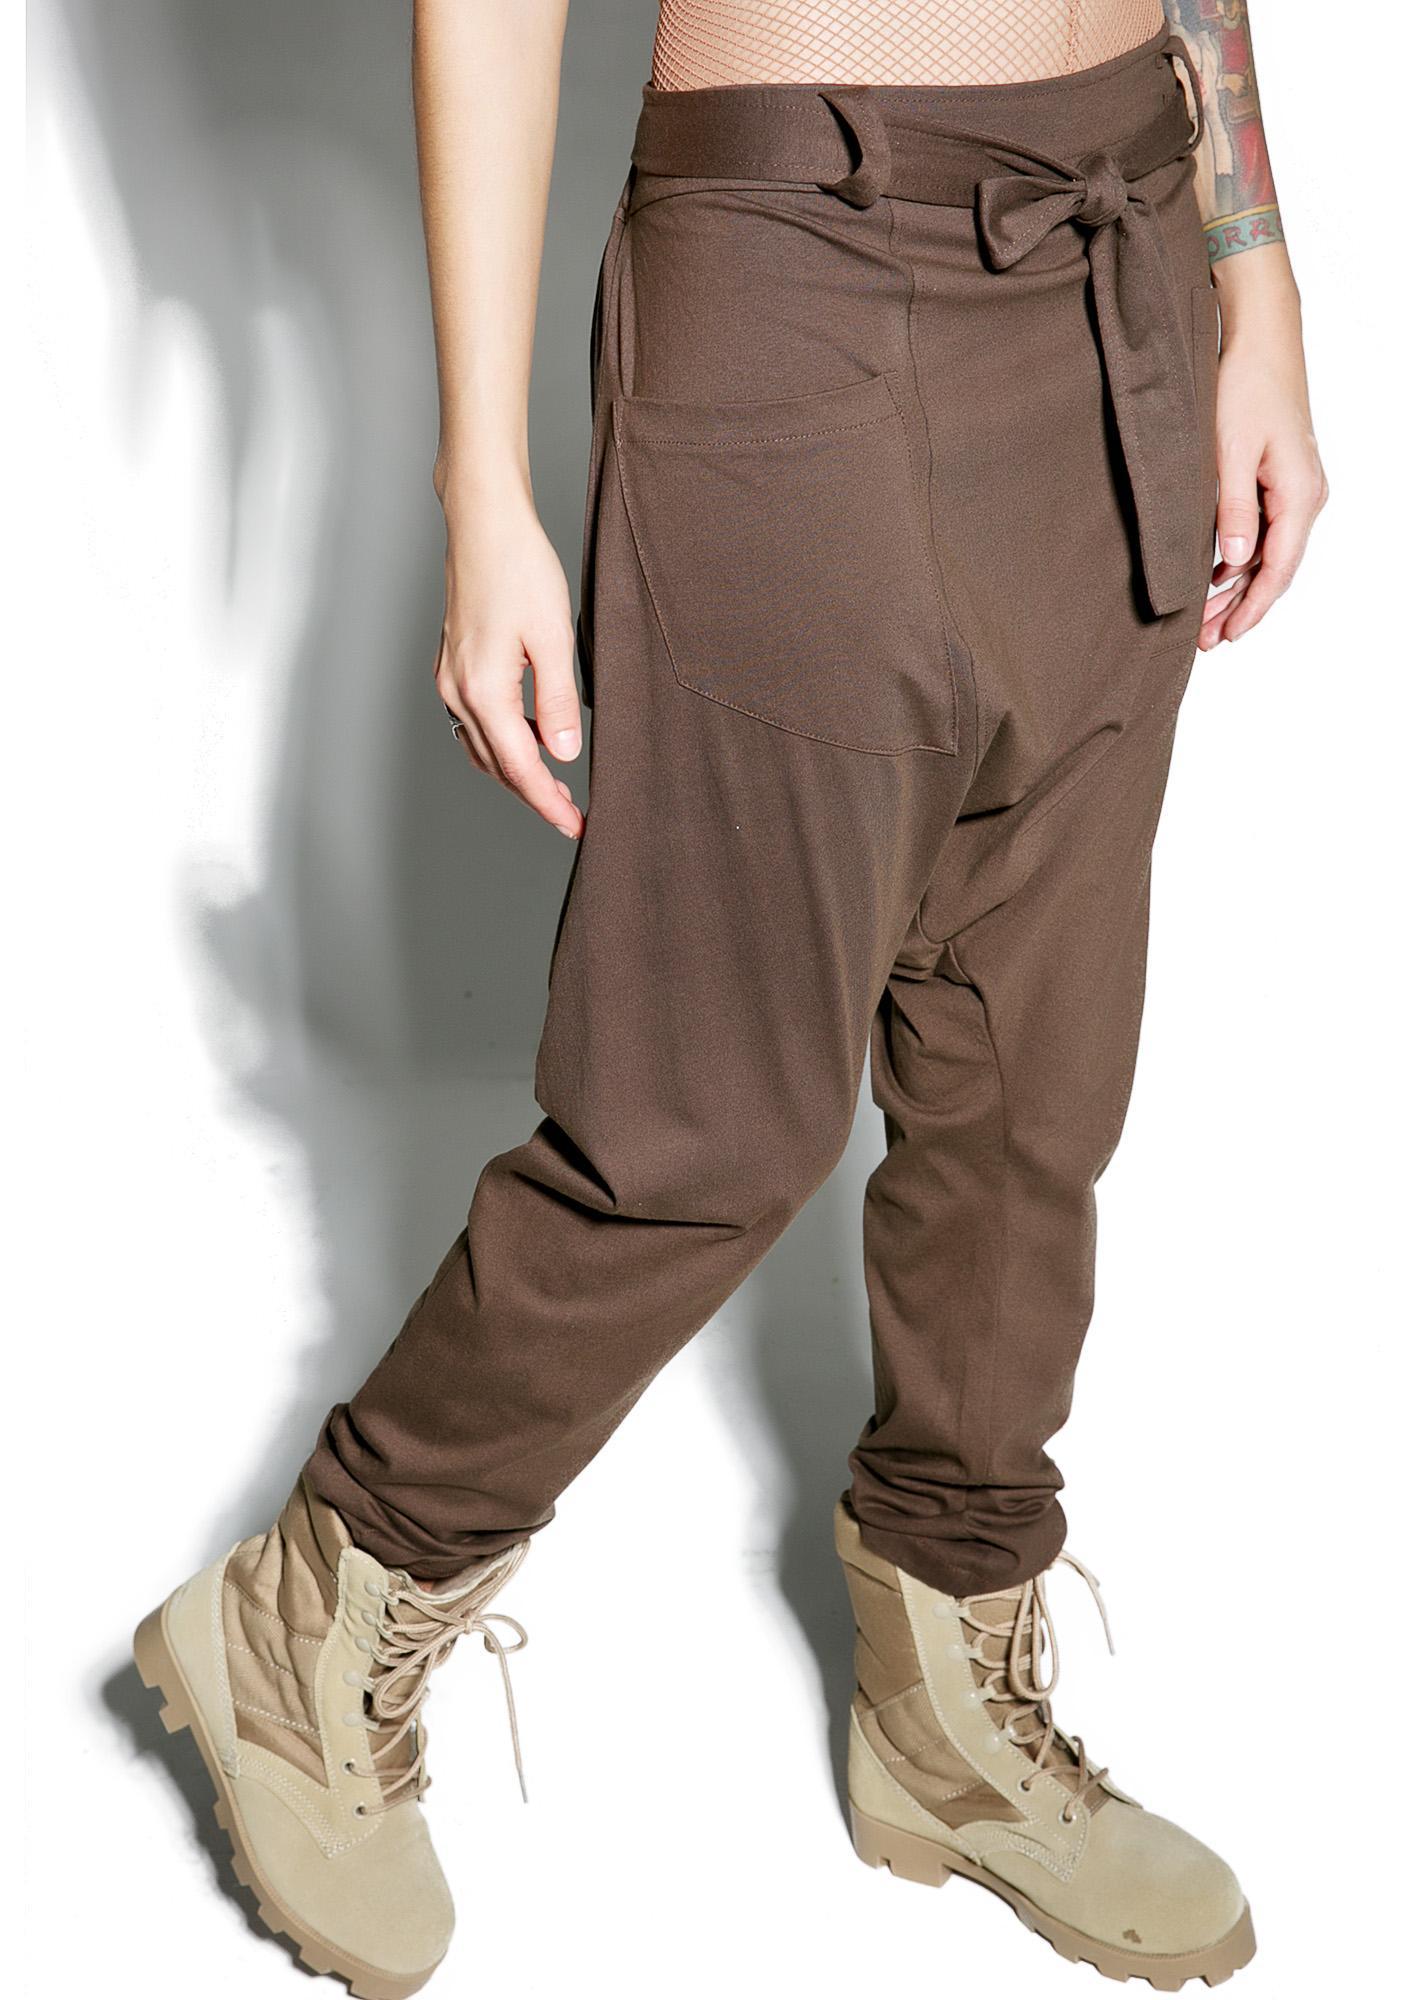 MNML Clipse Dropcrotch Pants